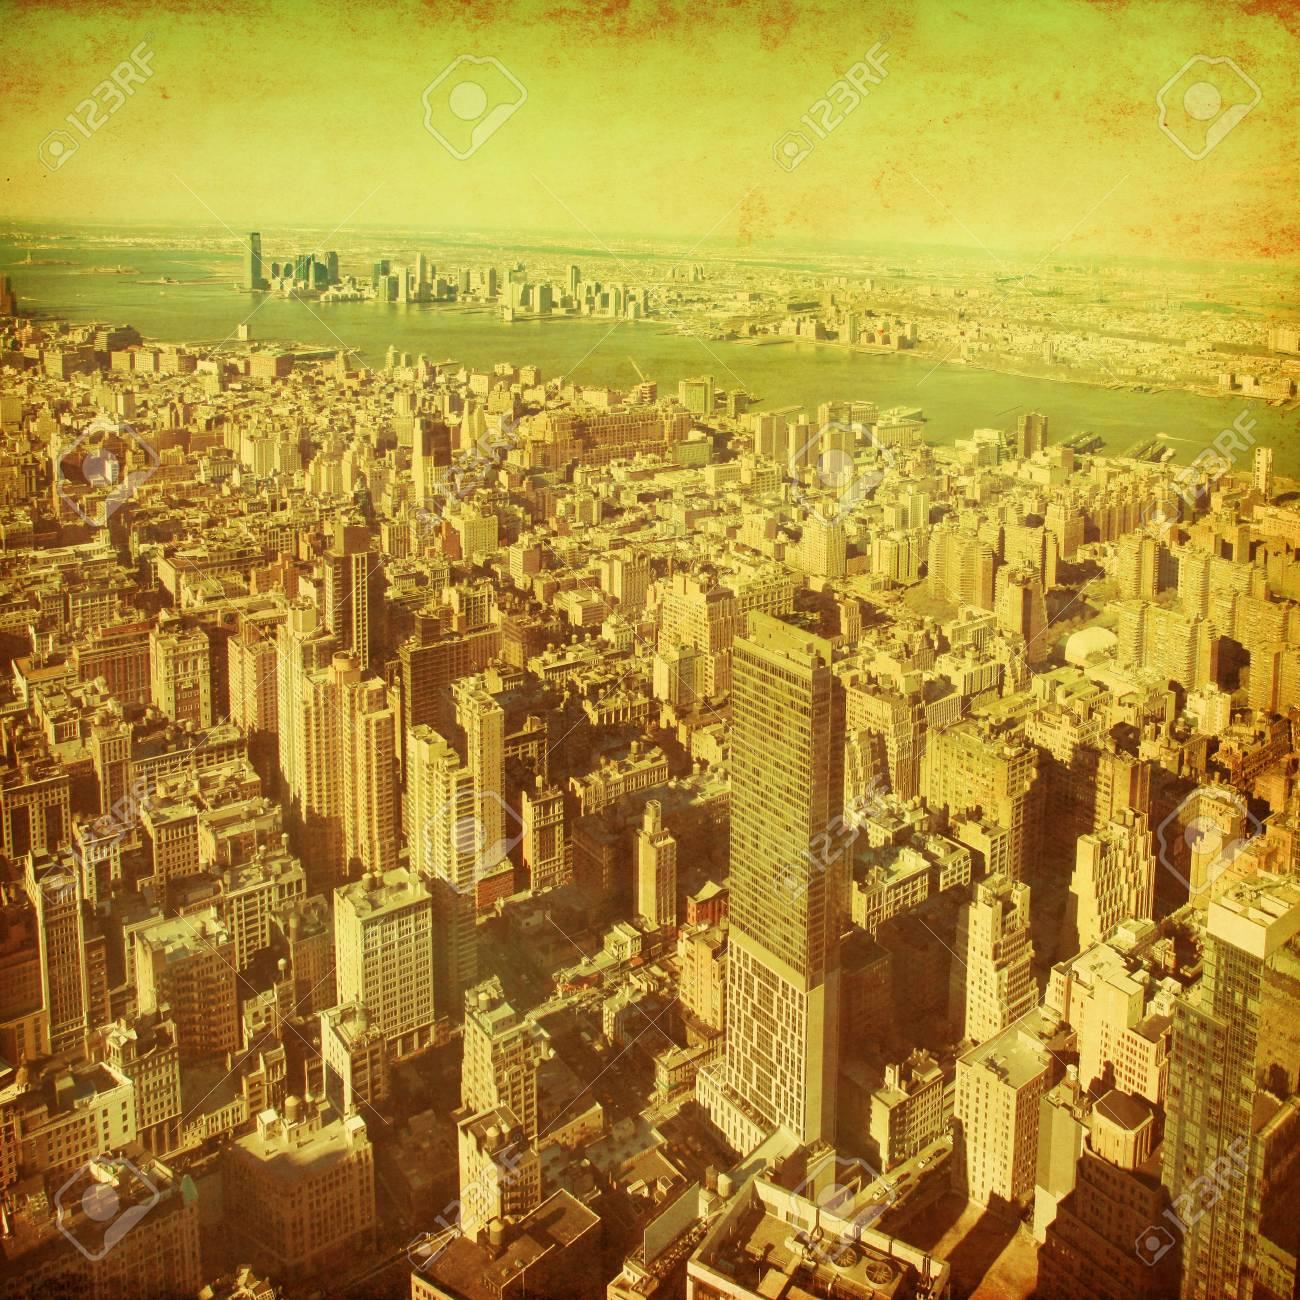 New York City Manhattan aerial view.Grunge and retro style. Stock Photo - 21847410